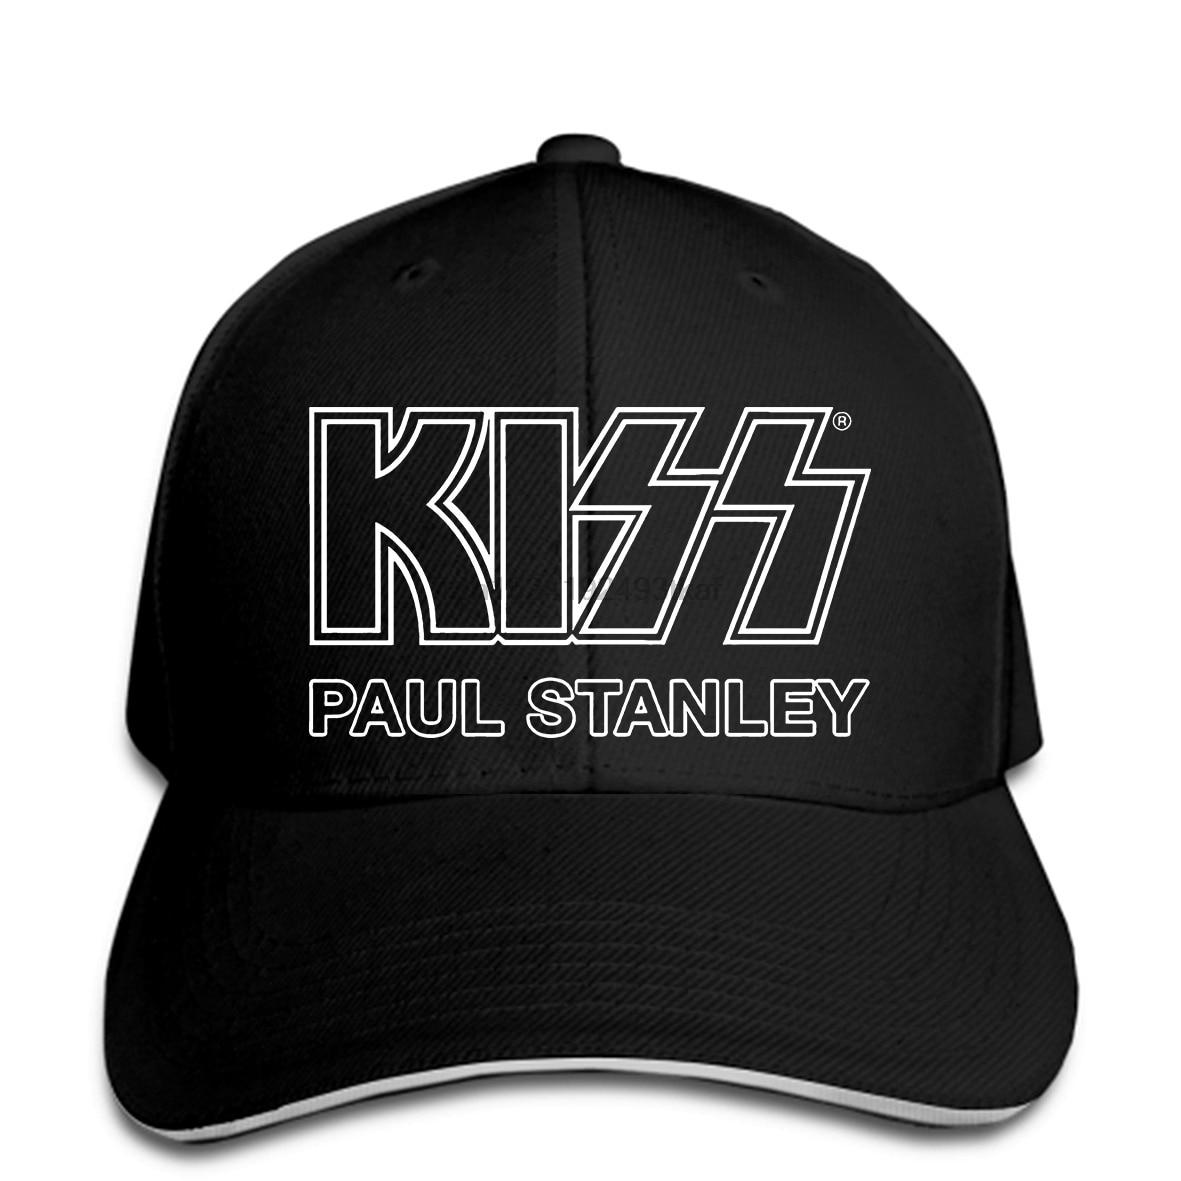 Baseball cap KISS Ace Frehley Brand New Impact Merchandising Hat Peaked cap